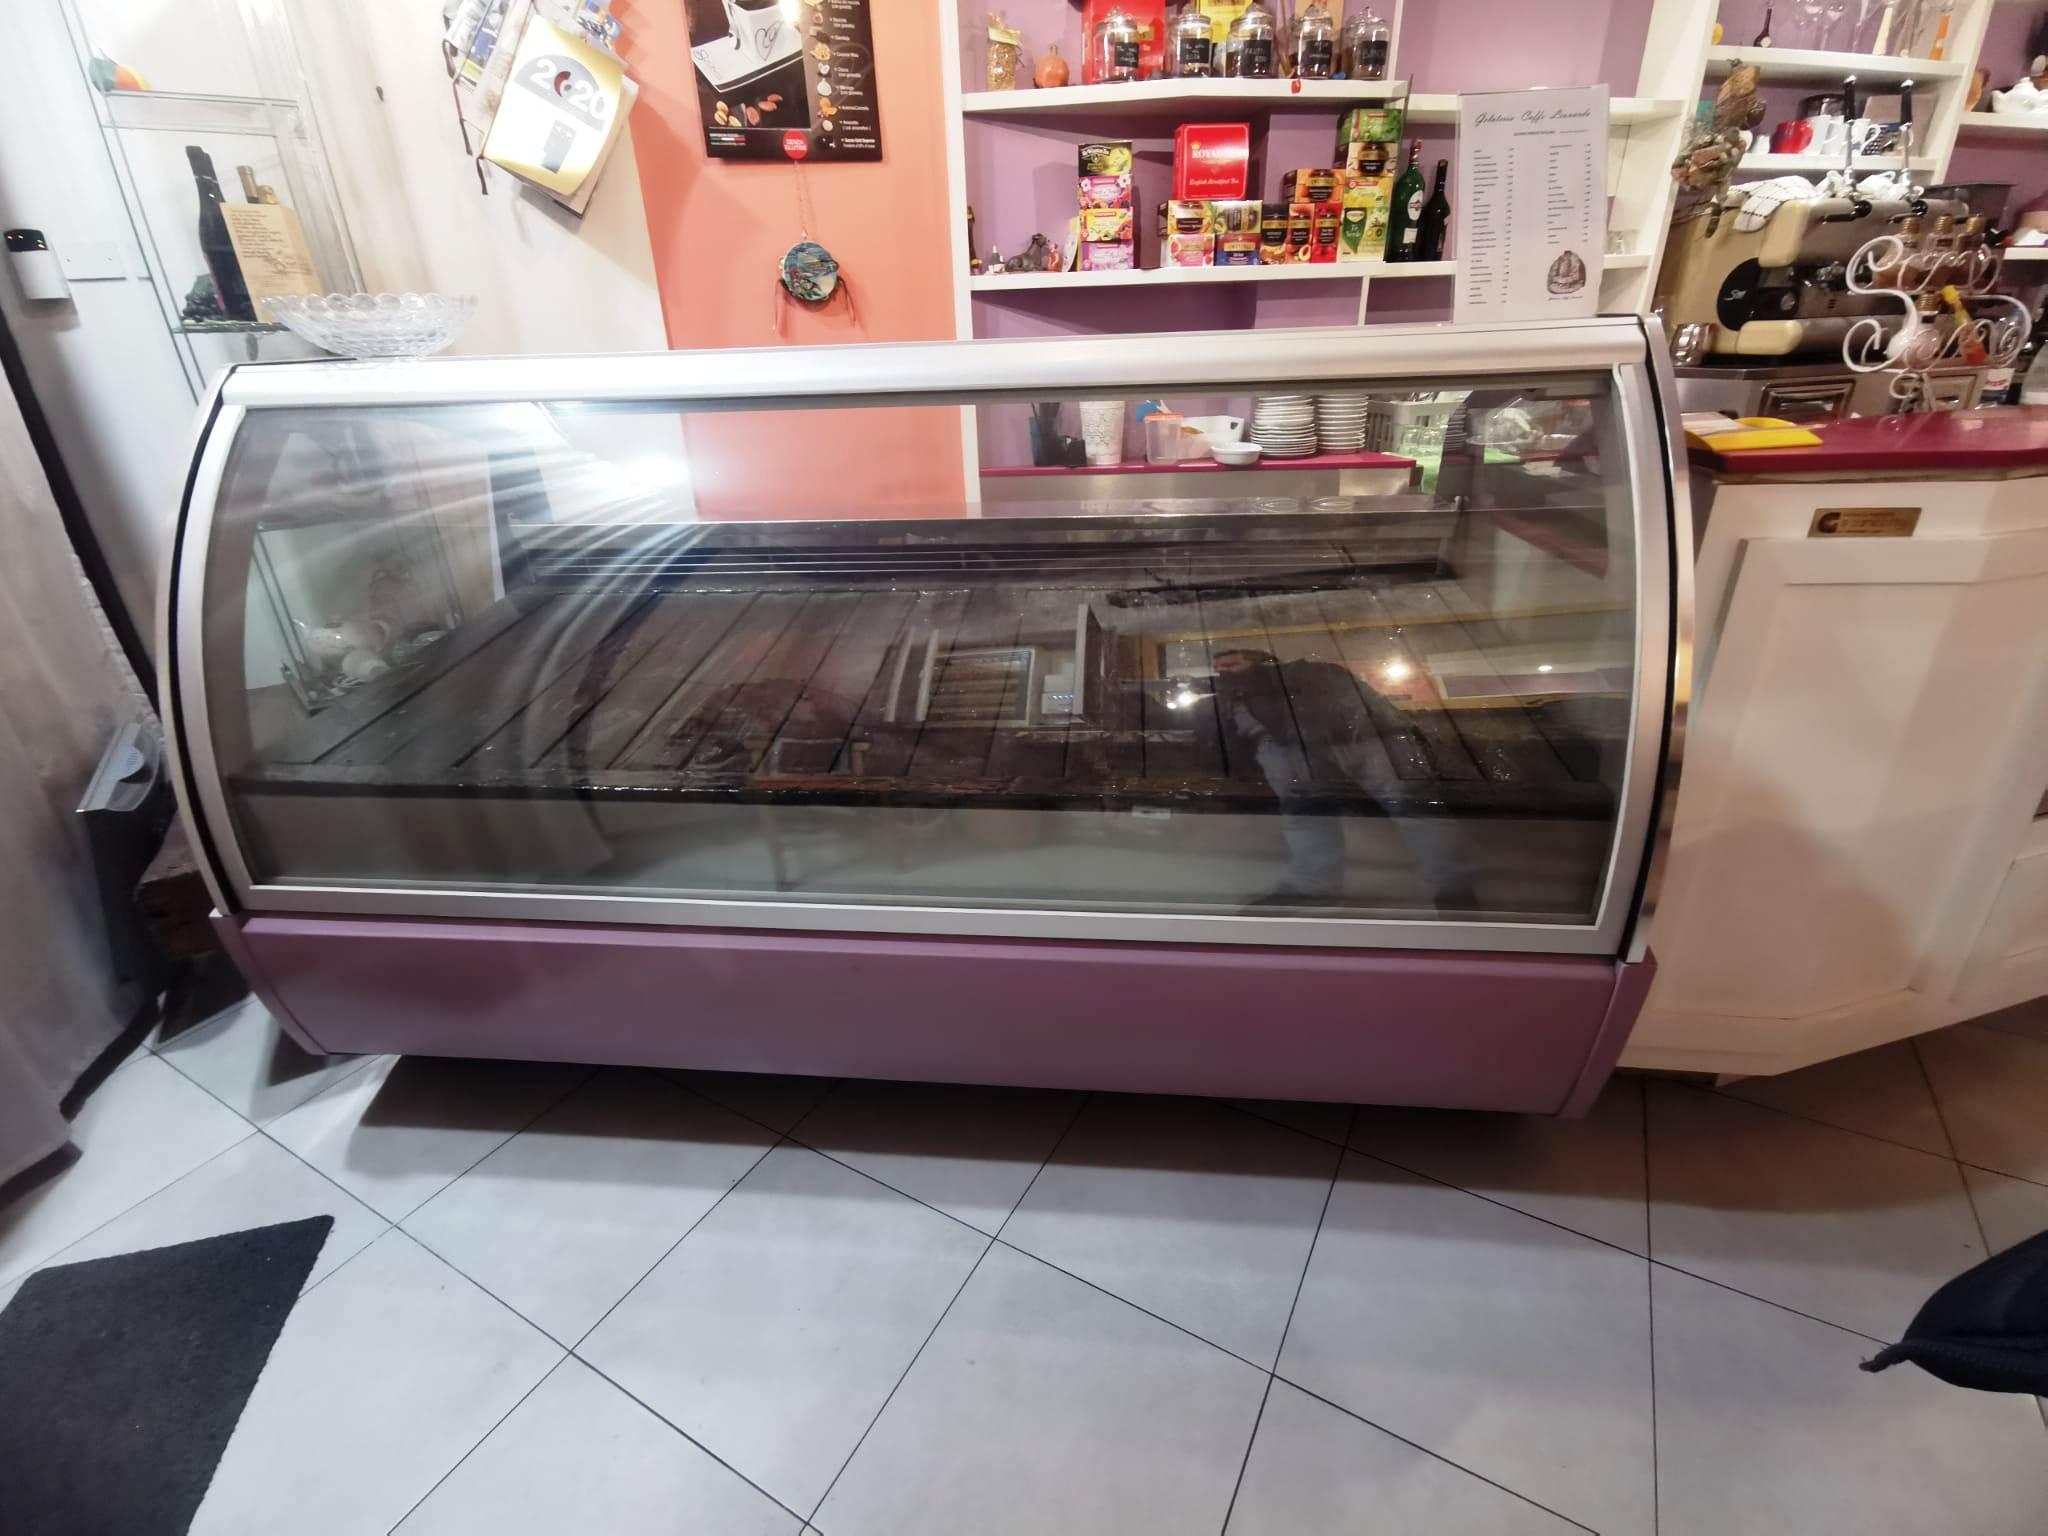 vetrina gelato proxima g12 fb in vendita - foto 1